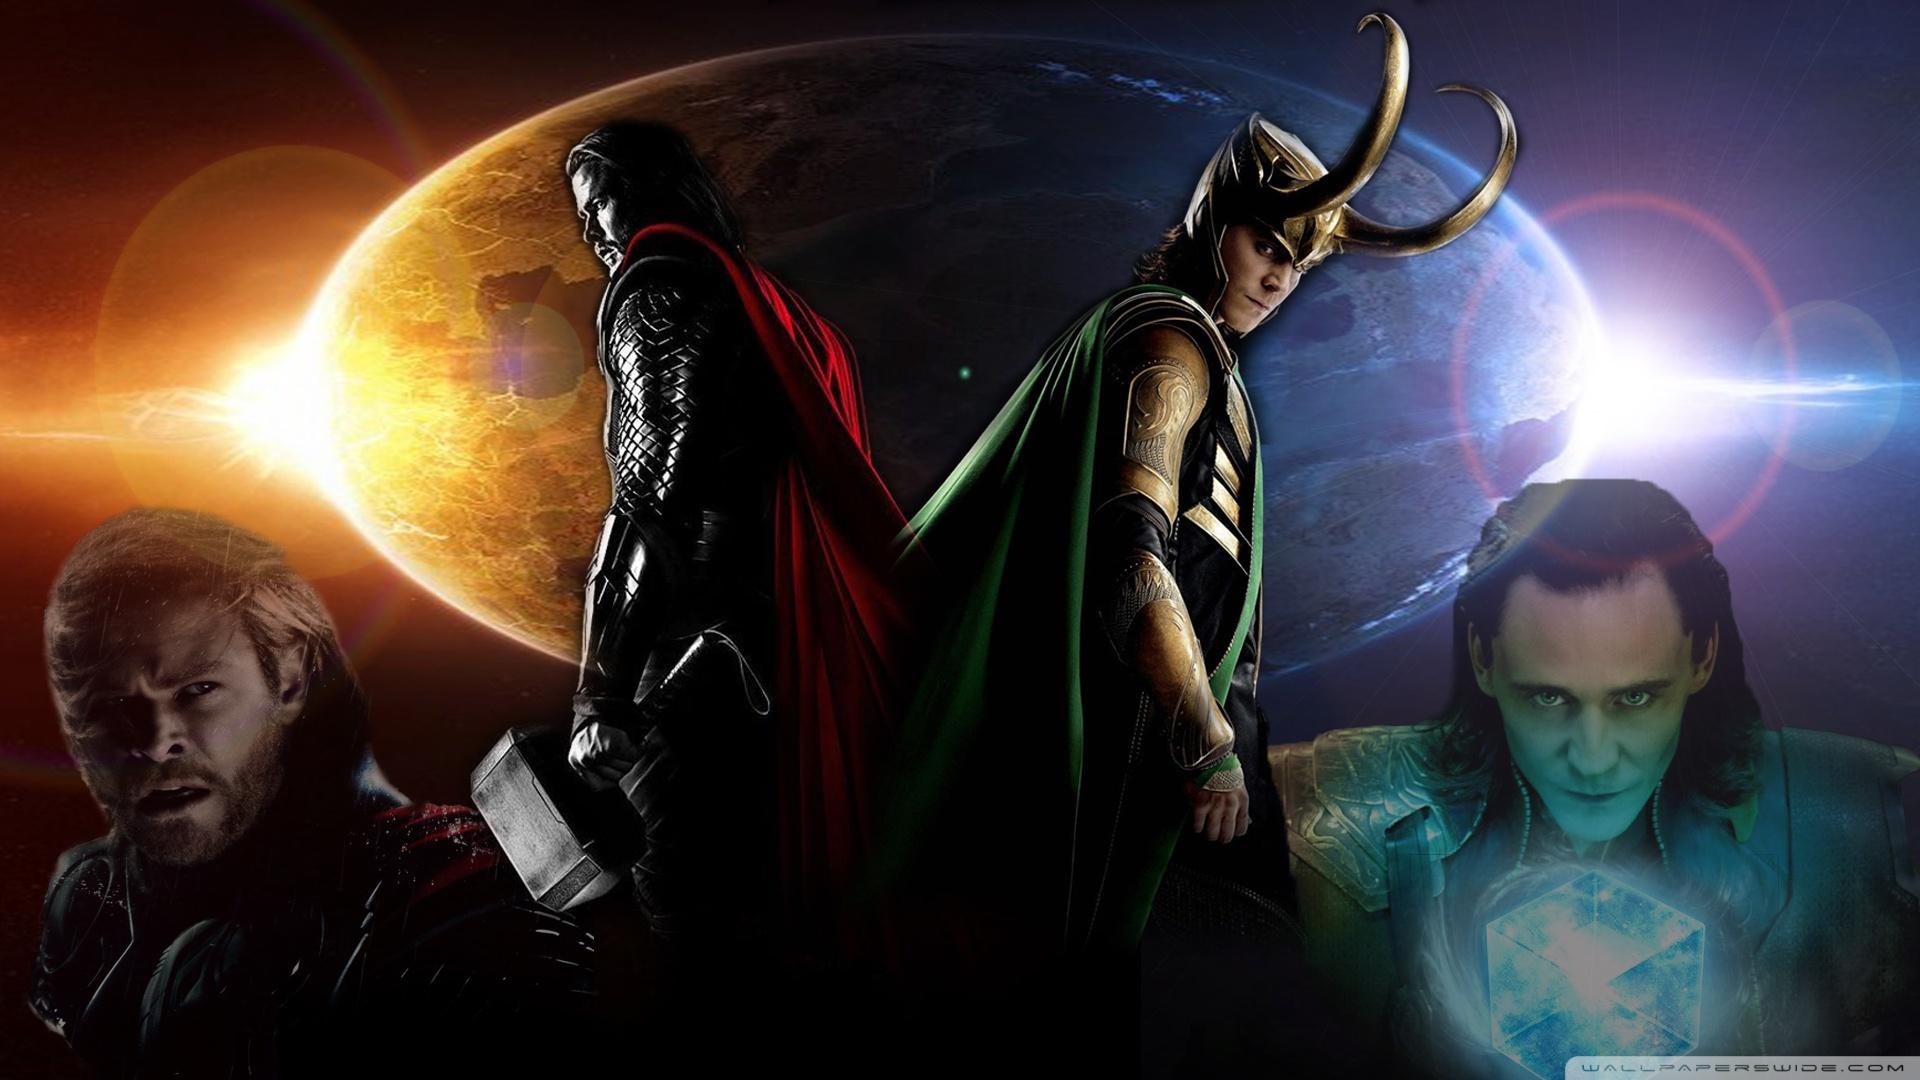 Thor And Loki Wallpaper Hd - HD Wallpaper